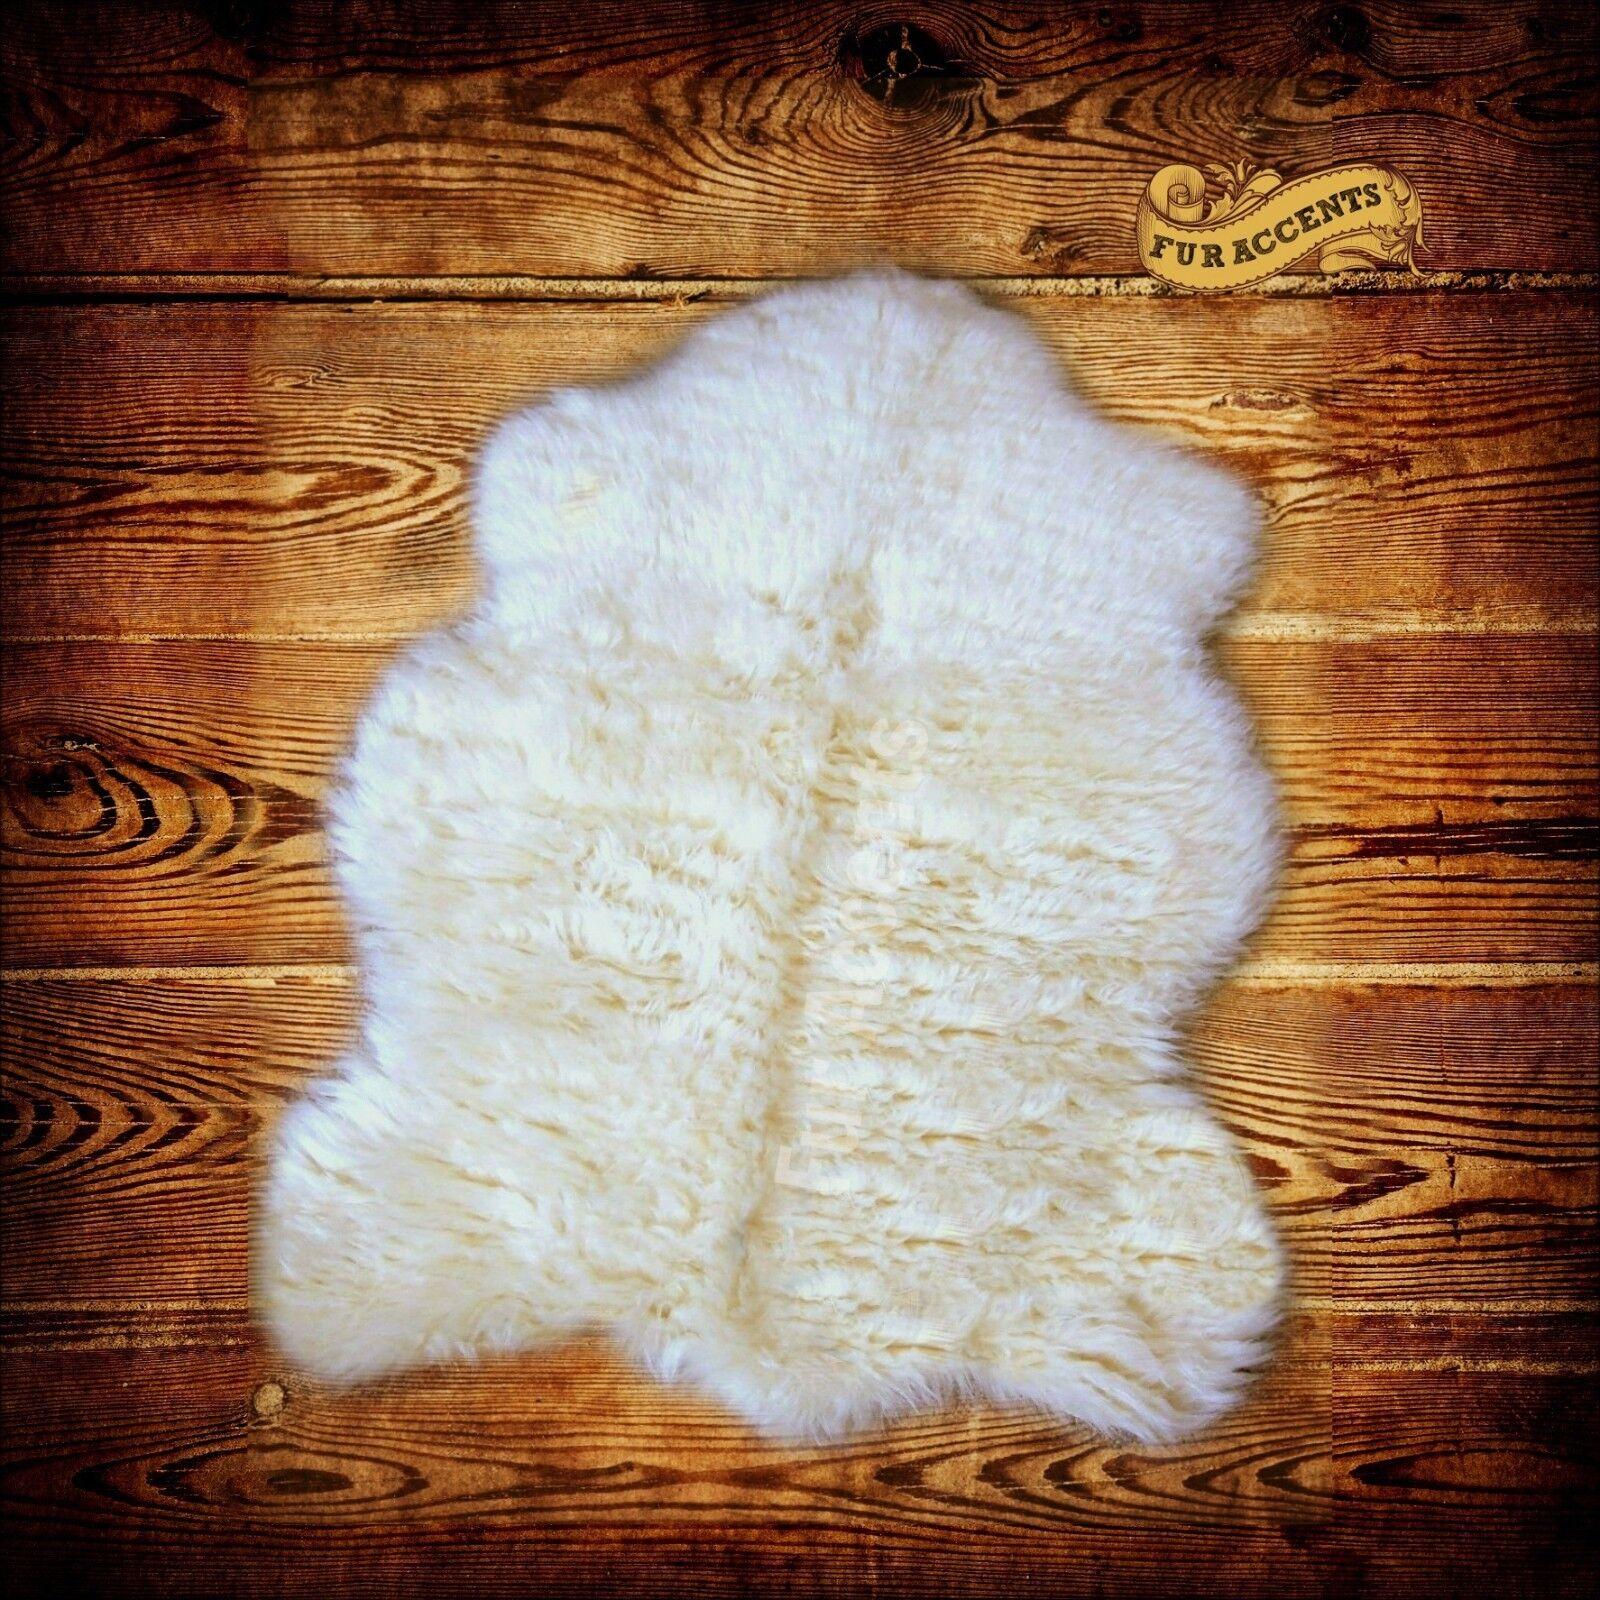 Sale Off bianca Shag Area Rug Faux Fur Shaggy Sheepskin